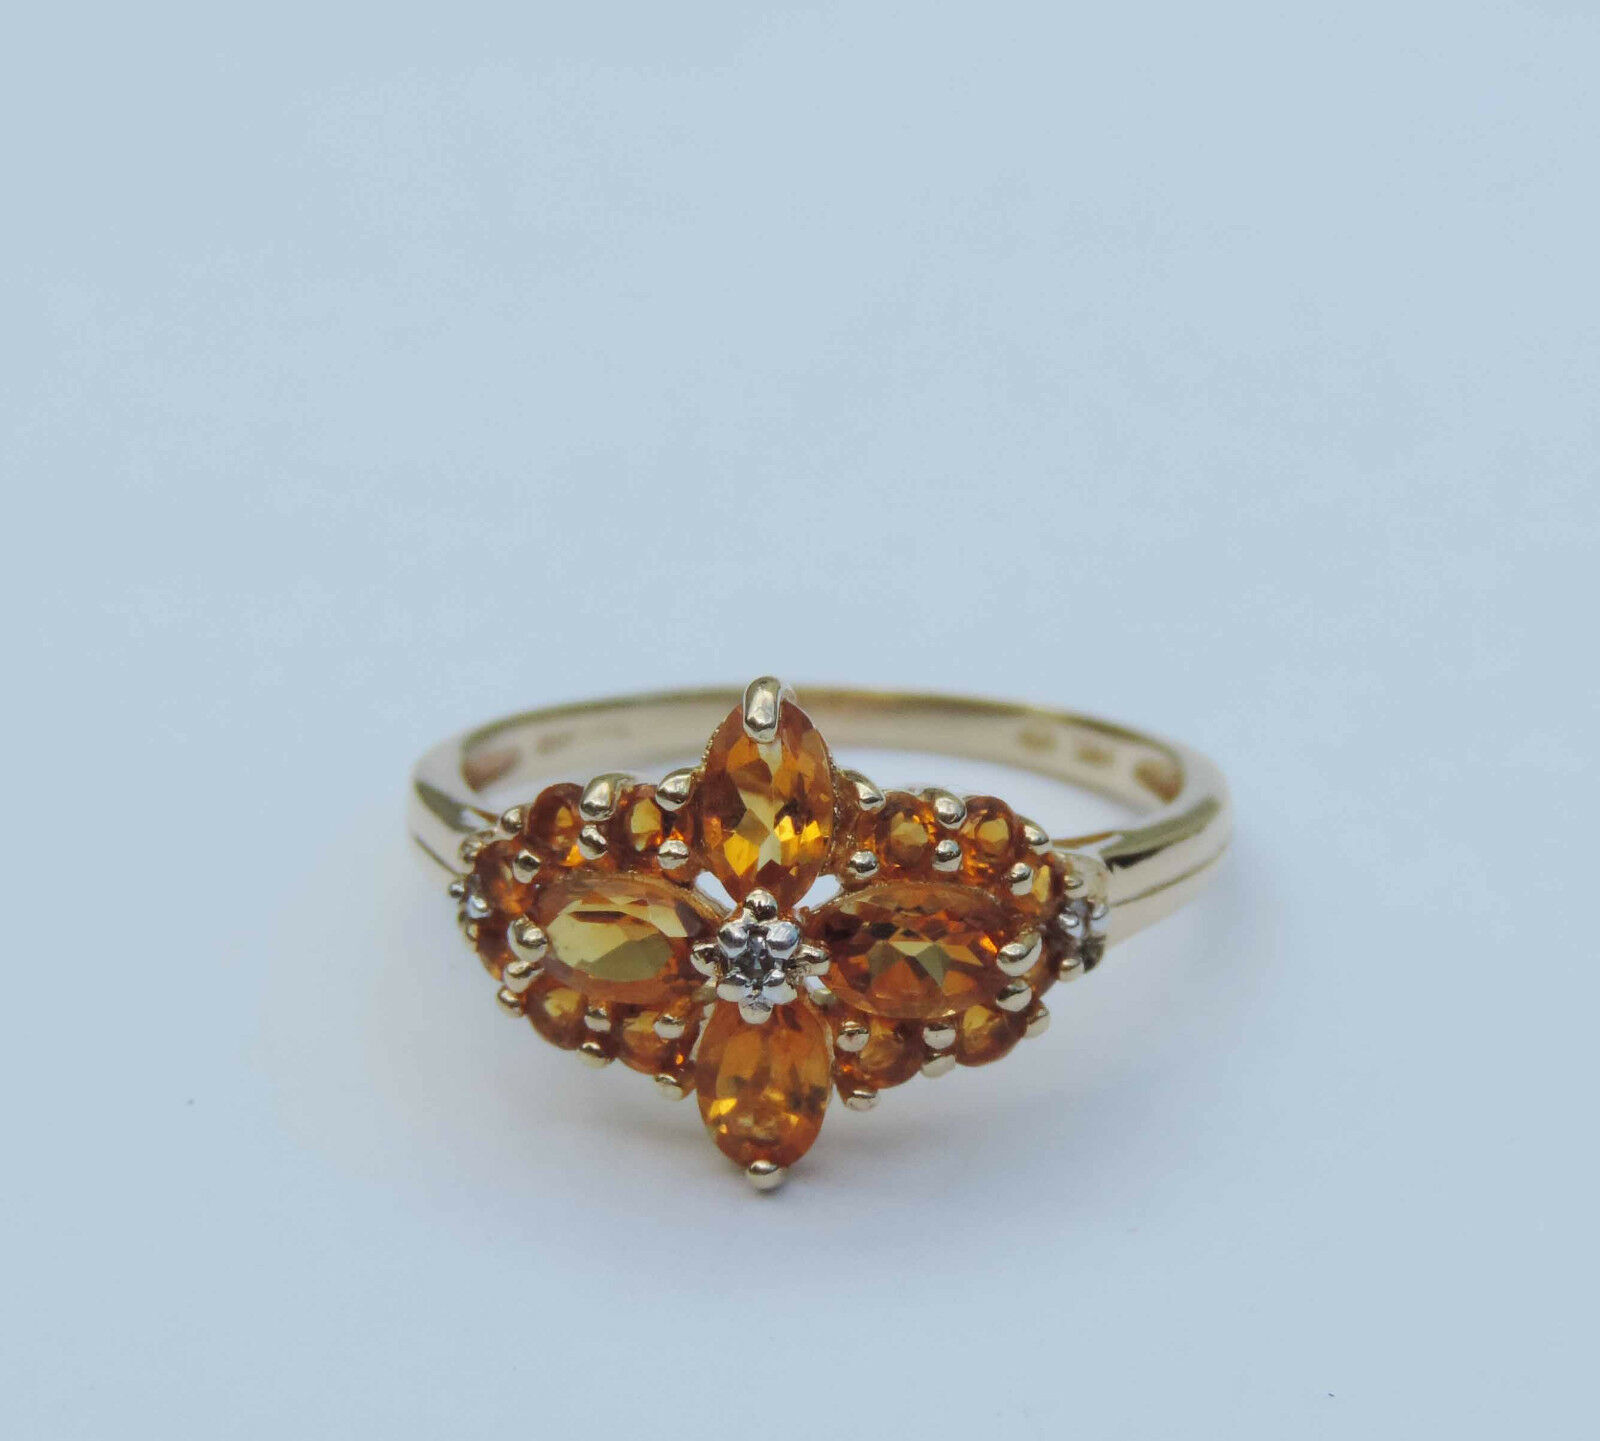 Genuine Citrine Gemstone Cluster Ring w  3 Diamond Accents - 14k Yellow gold